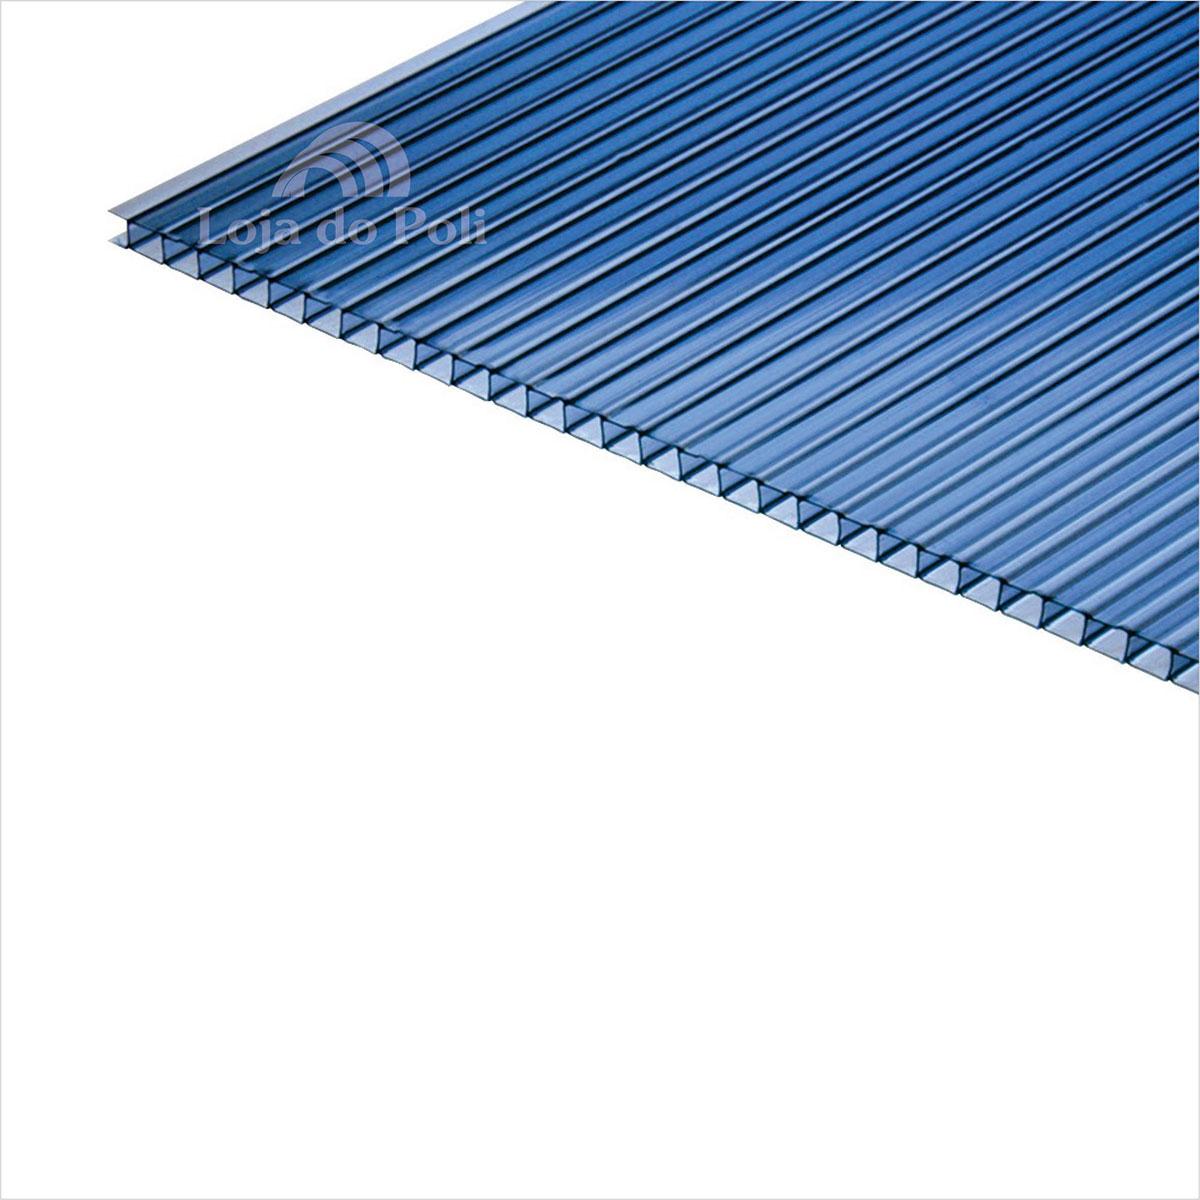 Chapa Policarbonato Alveolar Azul 4mm 1,0x6,0m